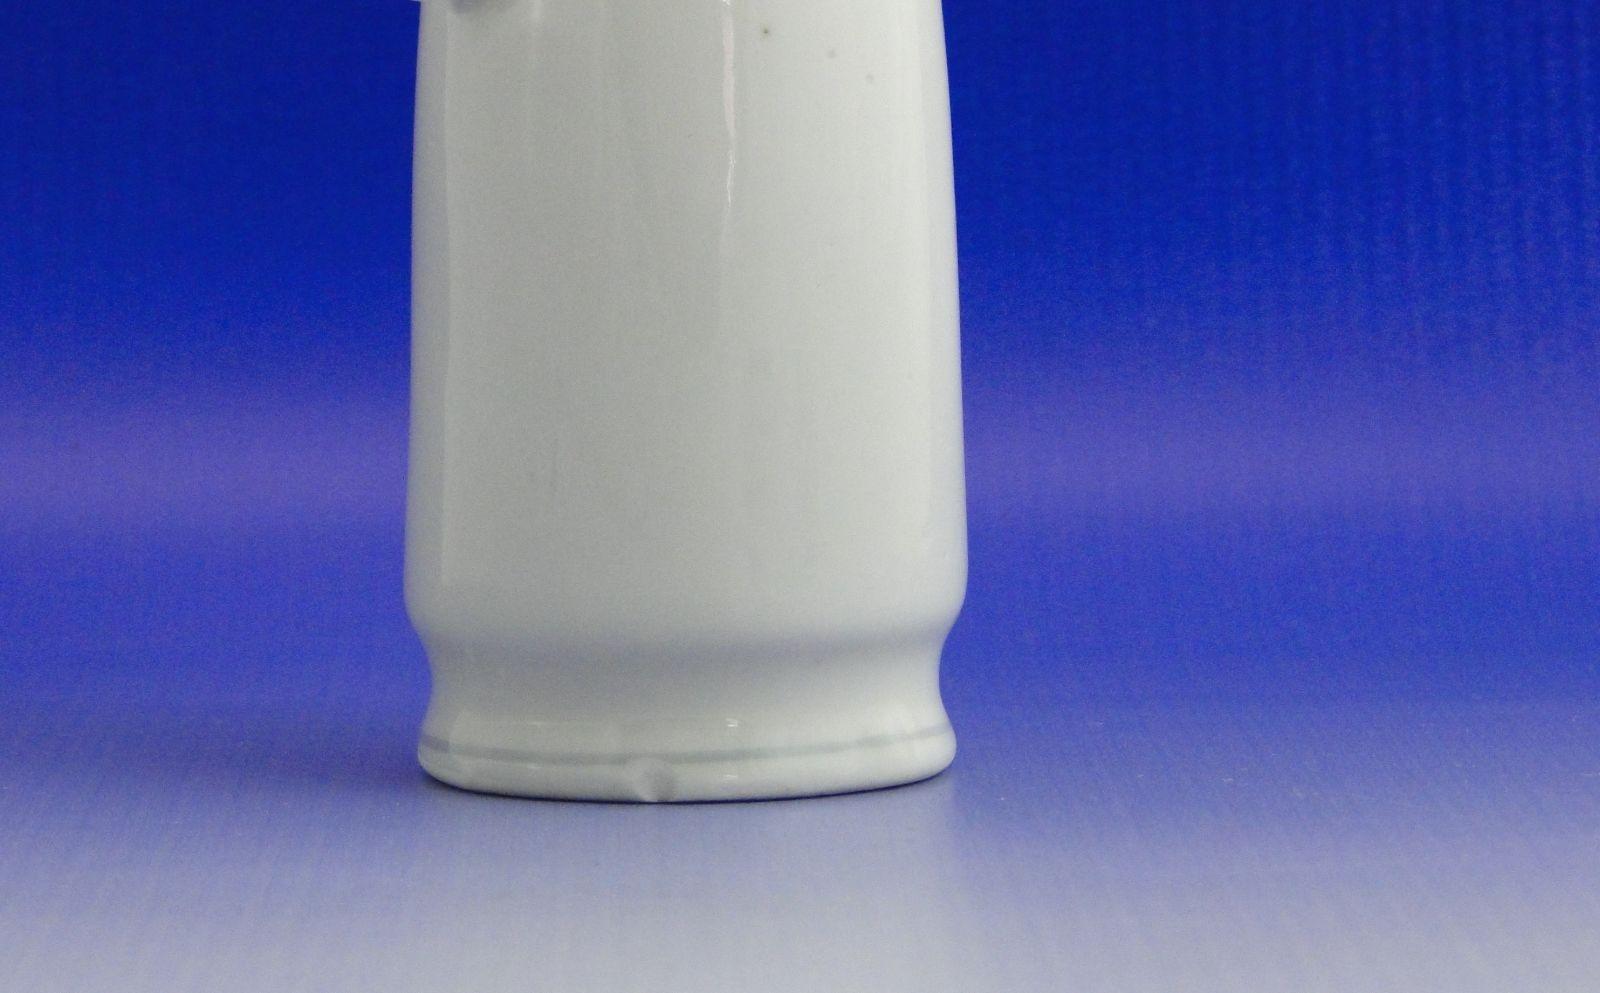 DSC09656.JPG (1600×993)